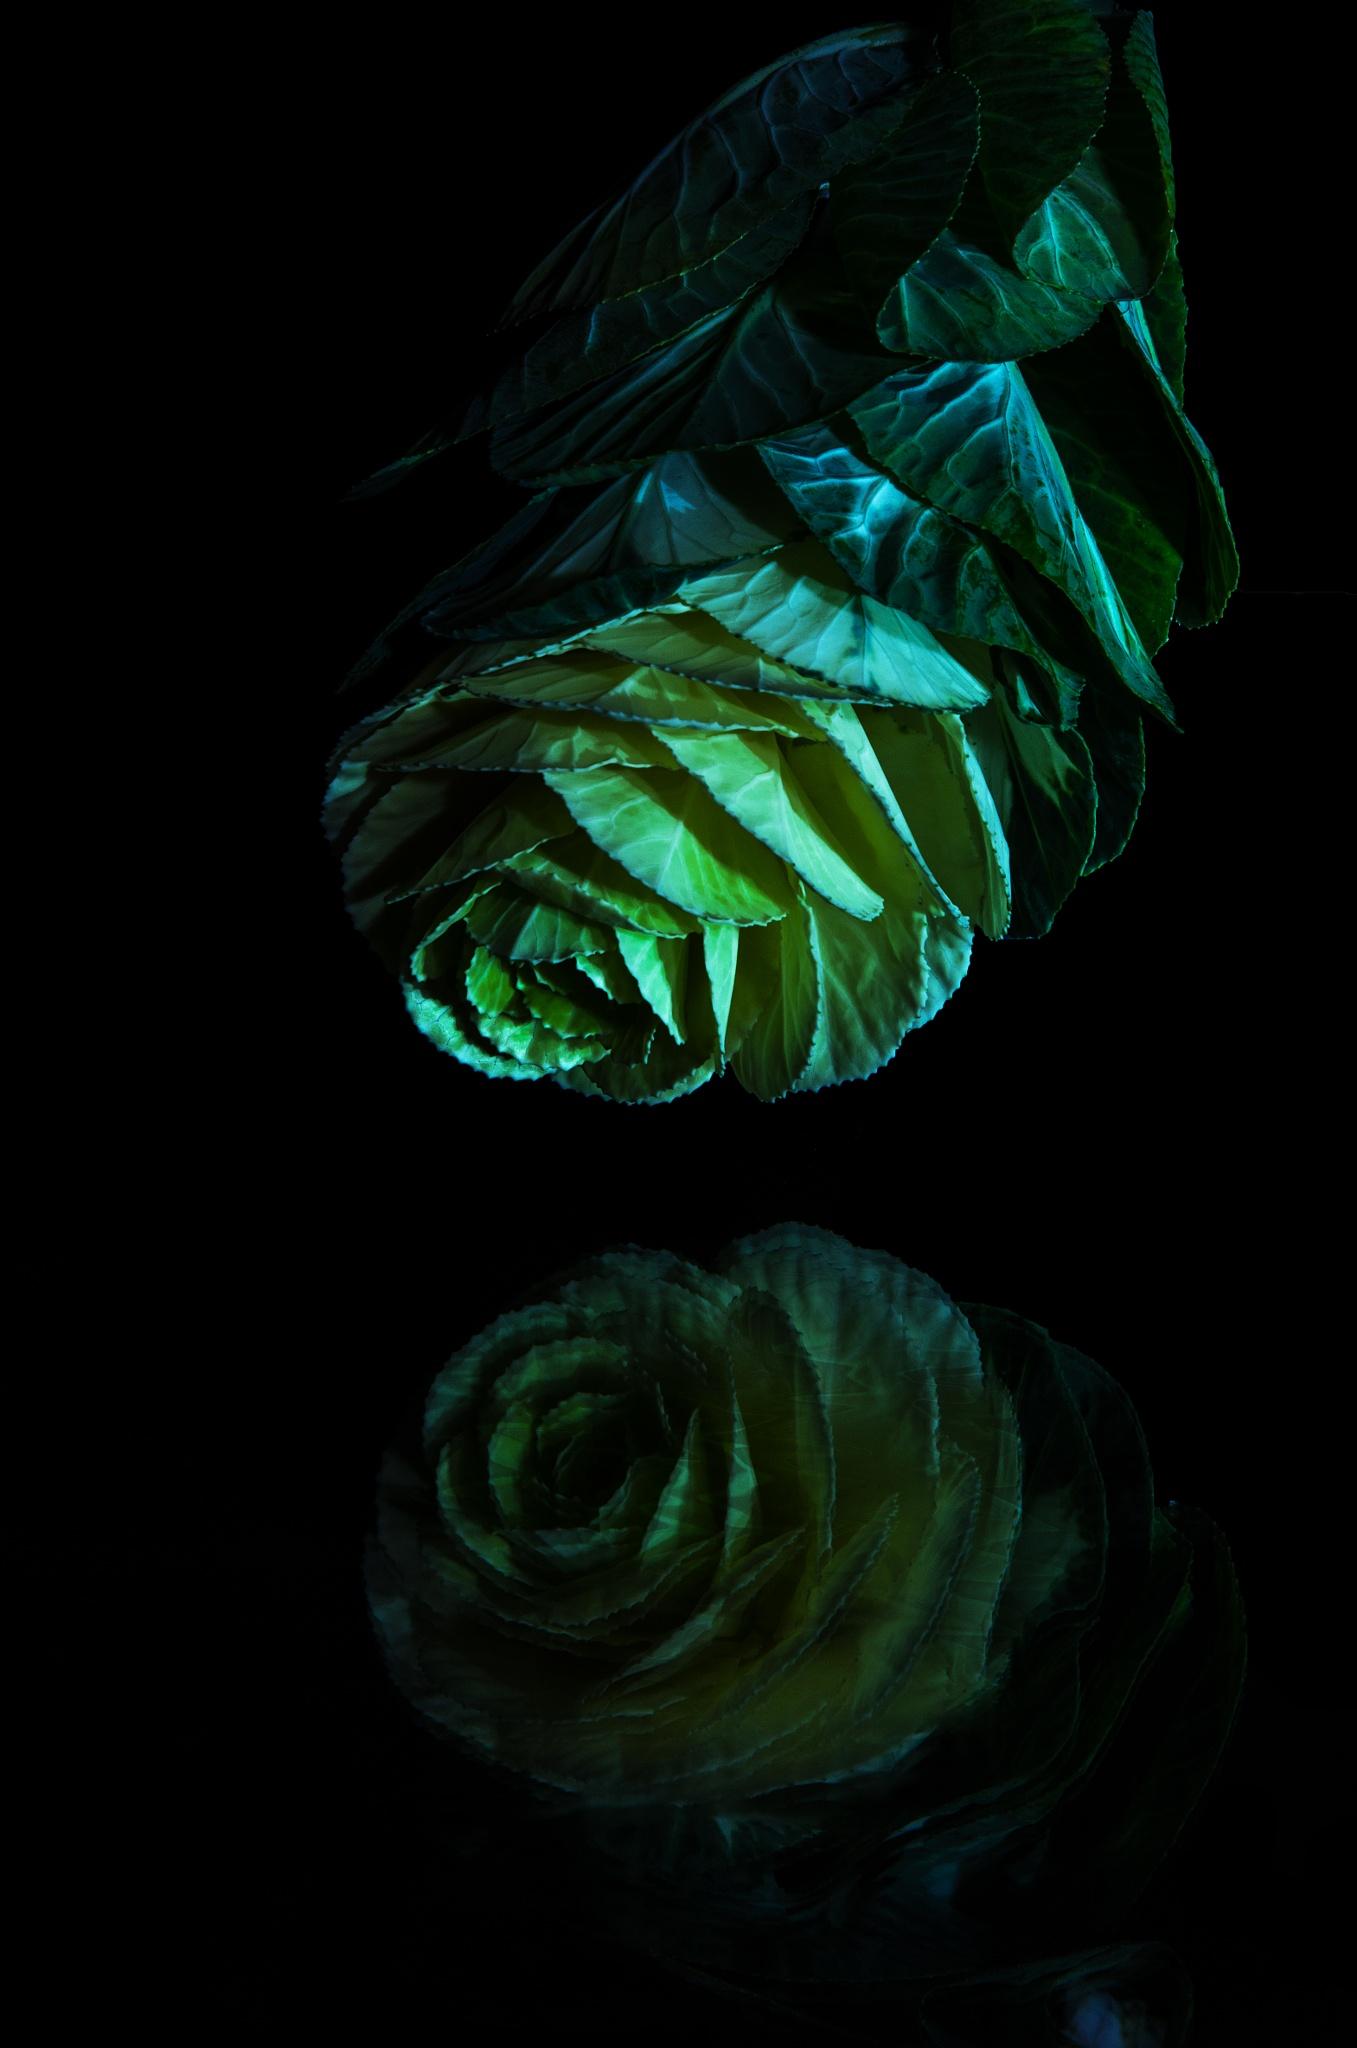 Brassica by EmanueleZ